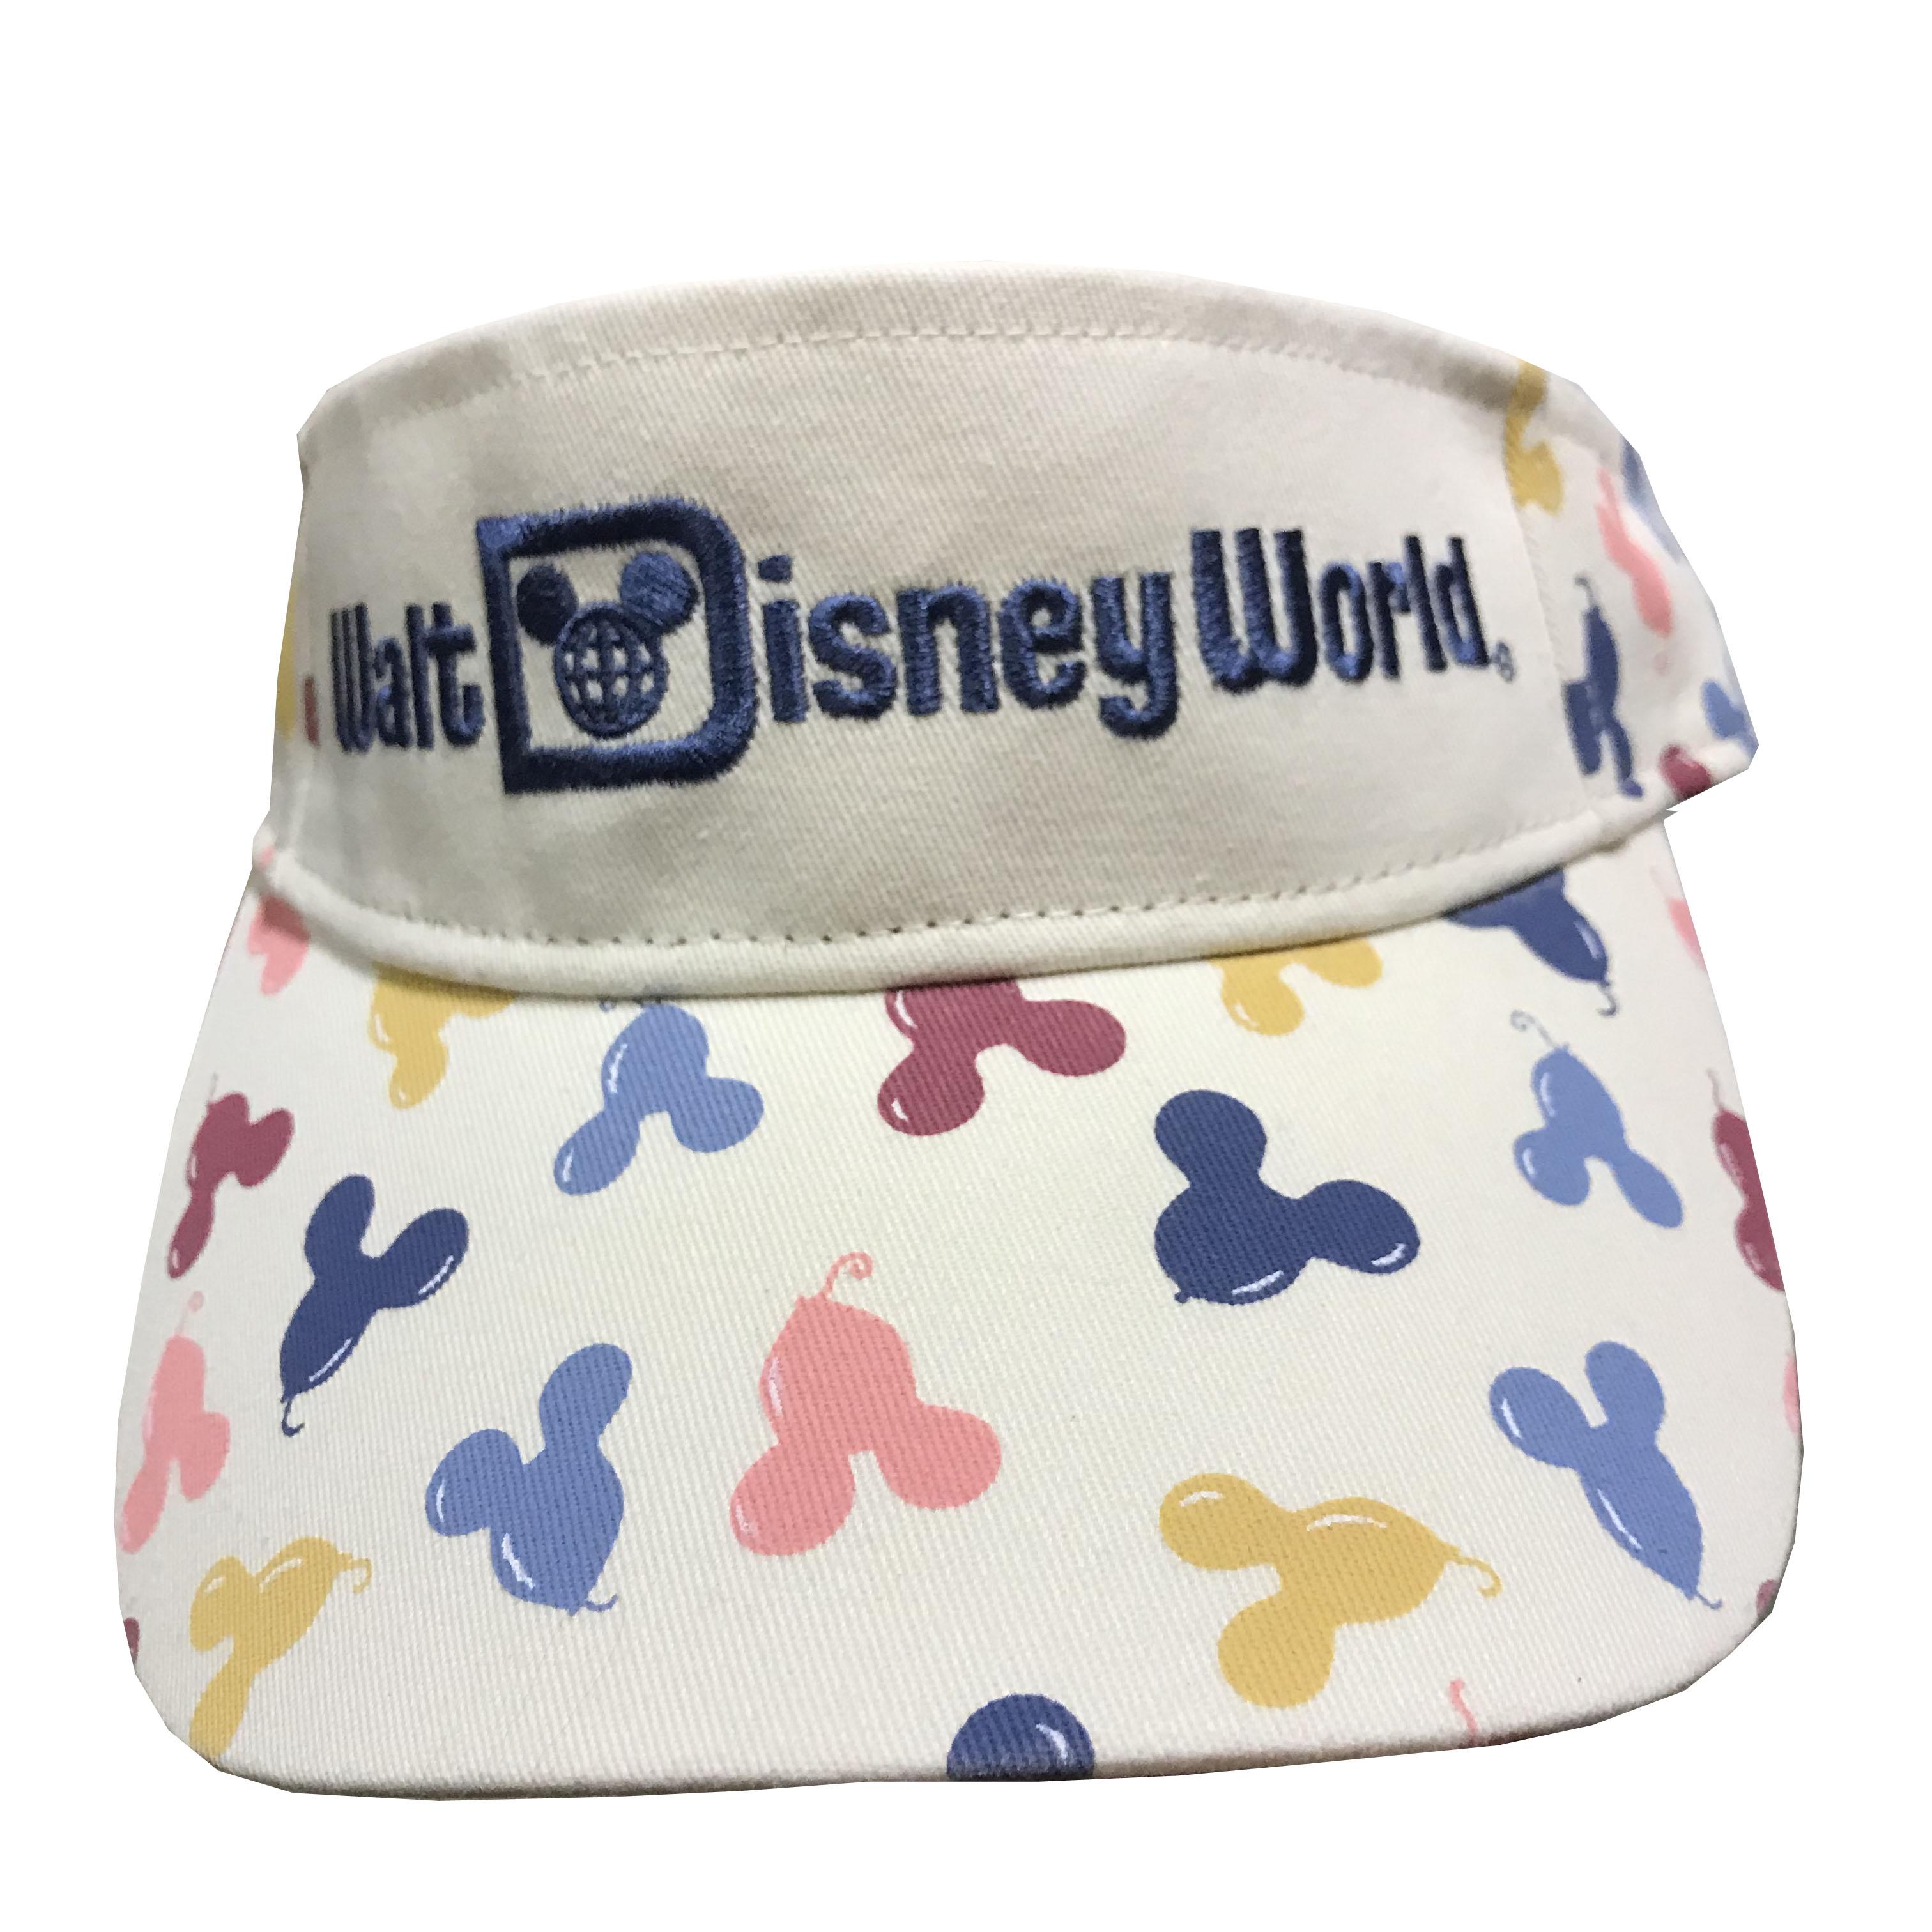 2d165a82c Disney Sun Visor Hat - Mickey Mouse Balloons - Walt Disney World